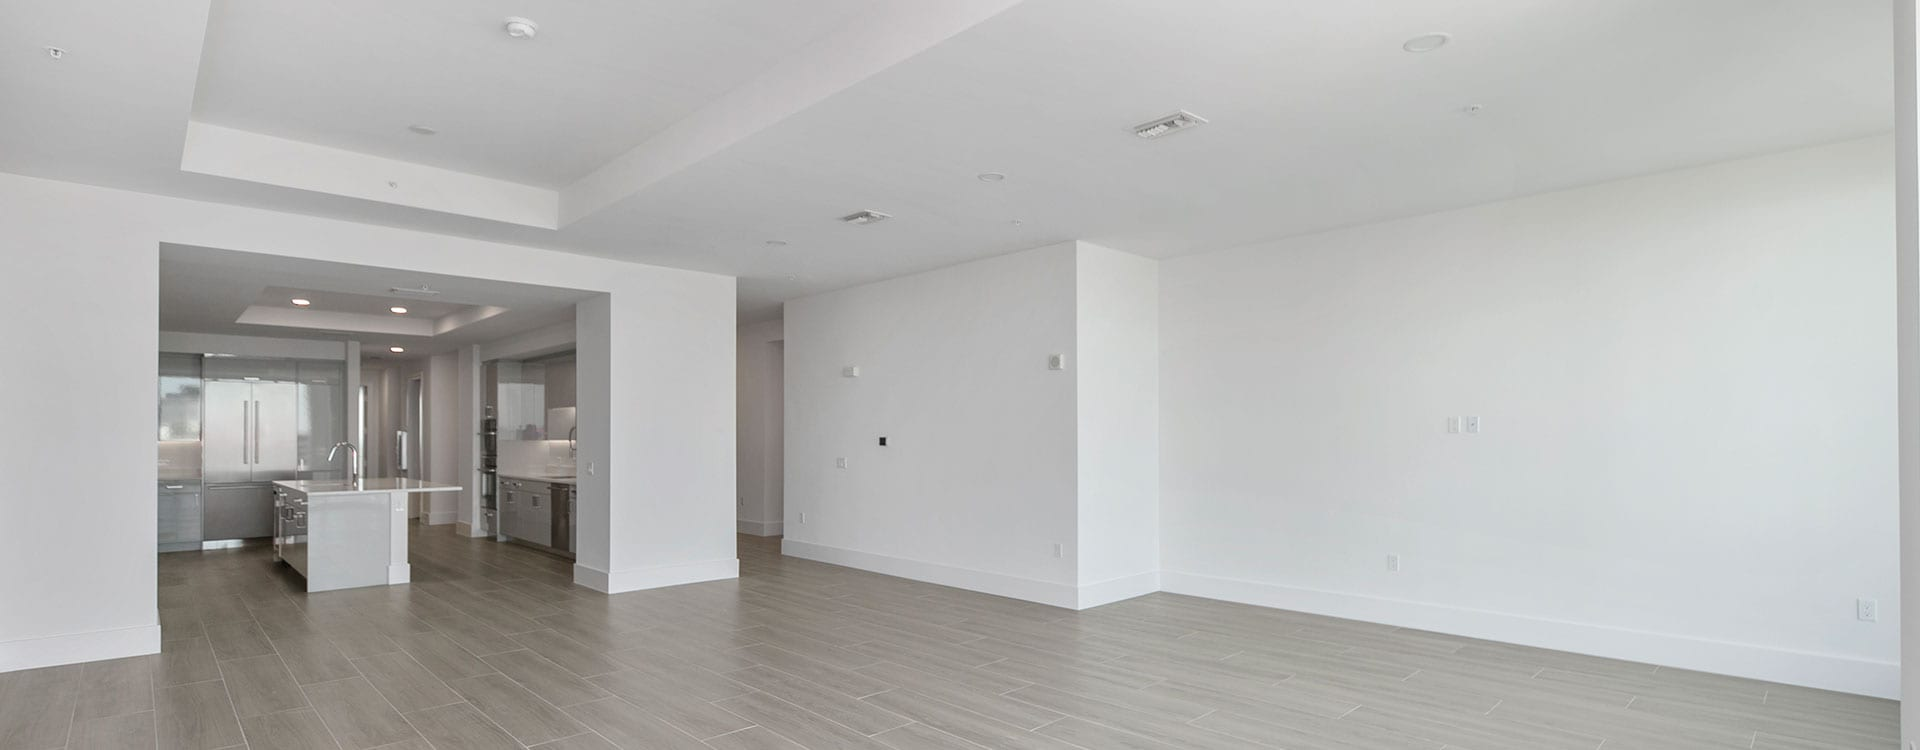 blvd sarasota residence 1503 Great Room